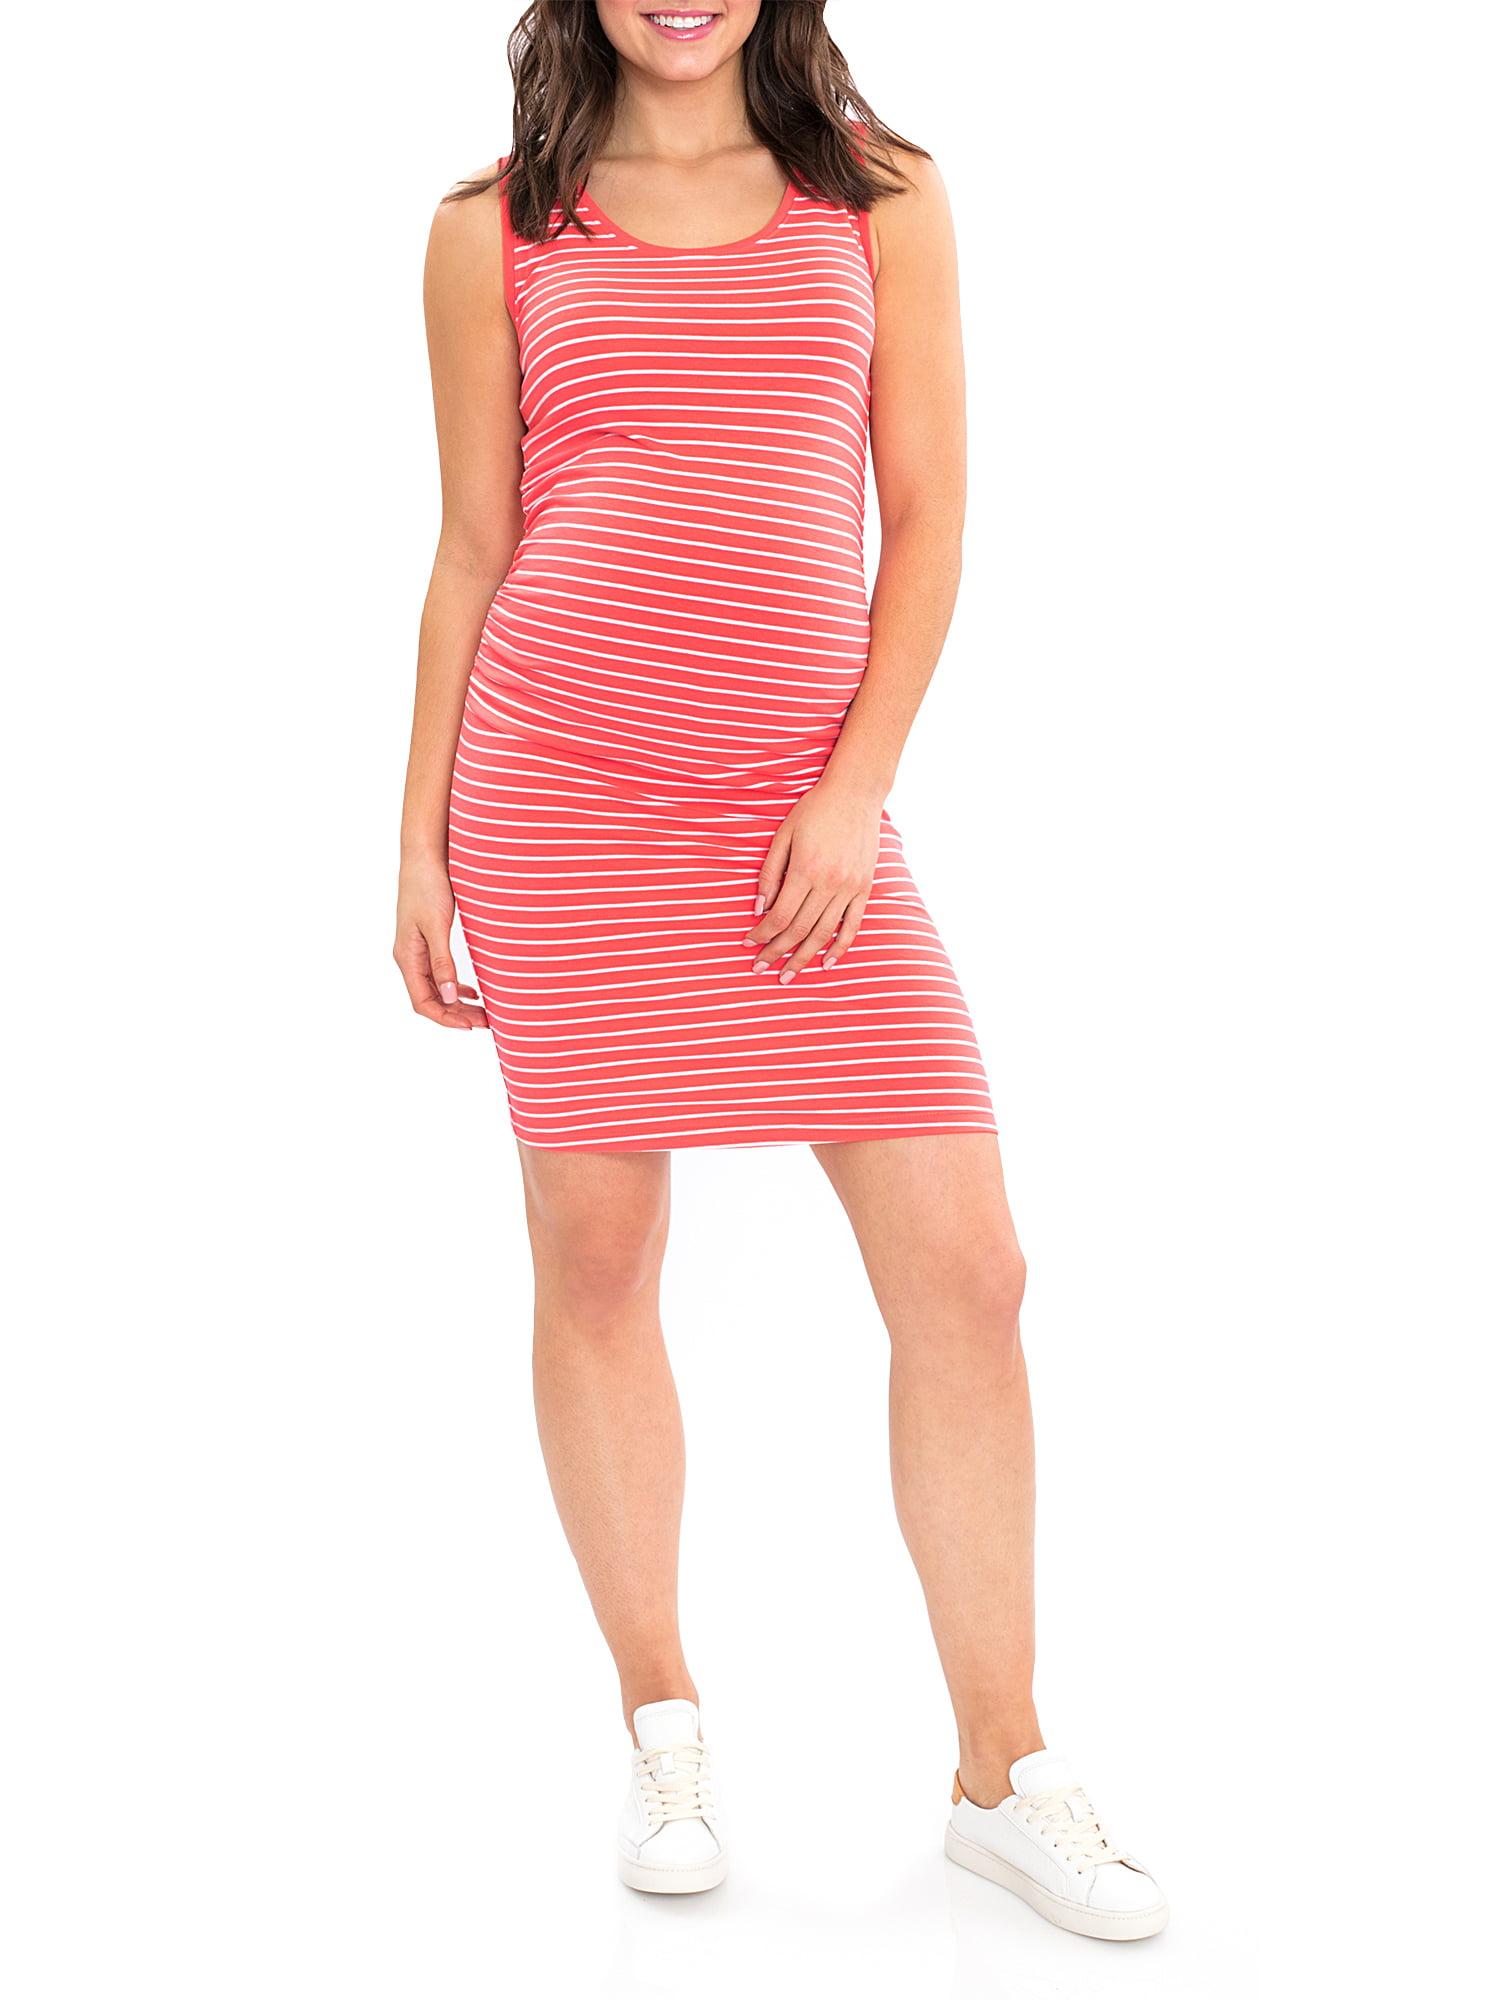 Maternity Tank Top Dress by Garan Mfg. Corp.